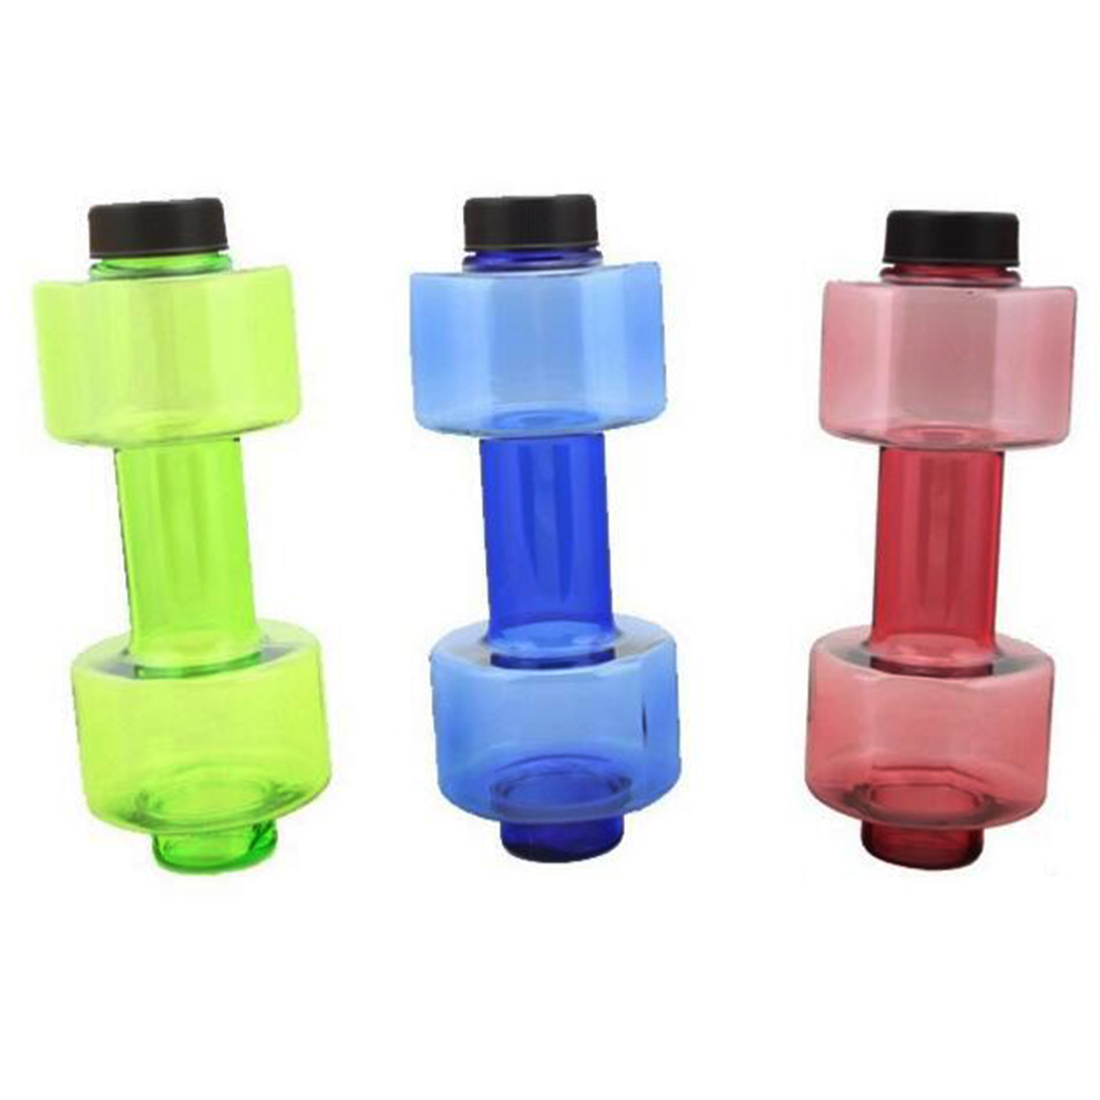 Creative Travel Outdoor Water Bottles Portable Dog Cat: Aliexpress.com : Buy 550ml Creative Plastic Fitness Water